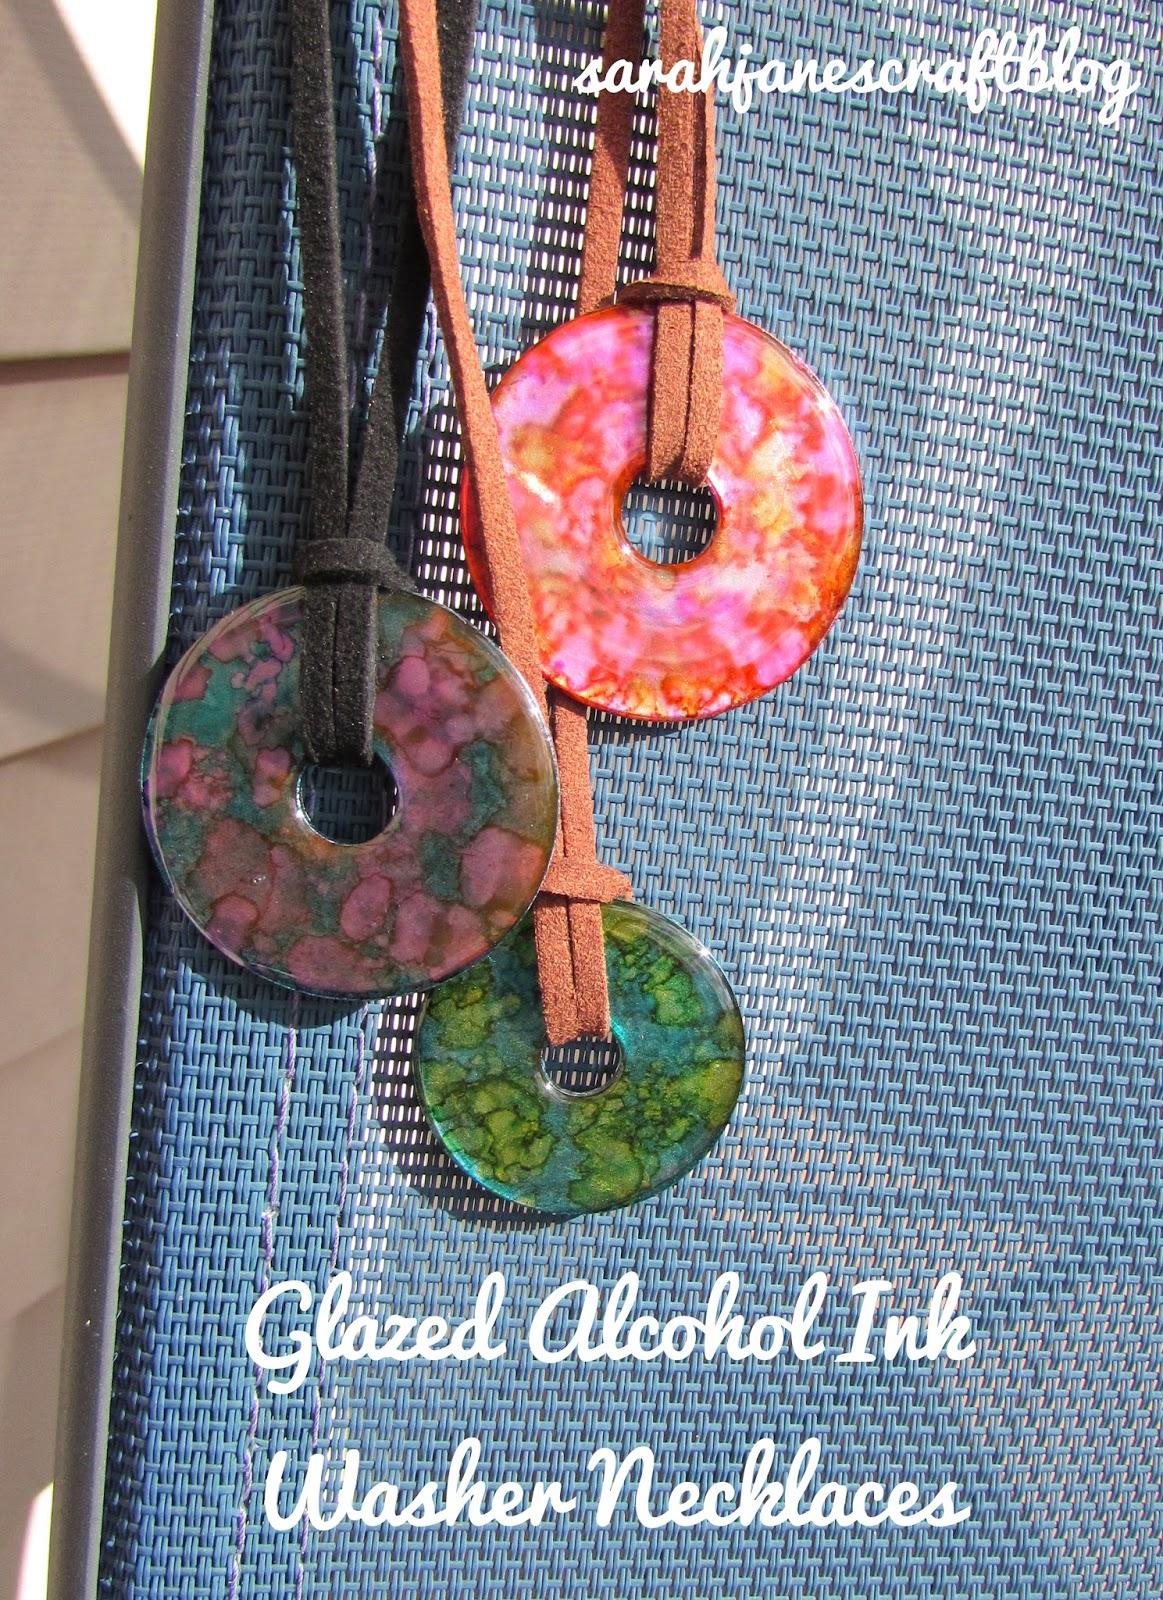 Sarah Jane S Craft Blog More Glazed Alcohol Ink Washers